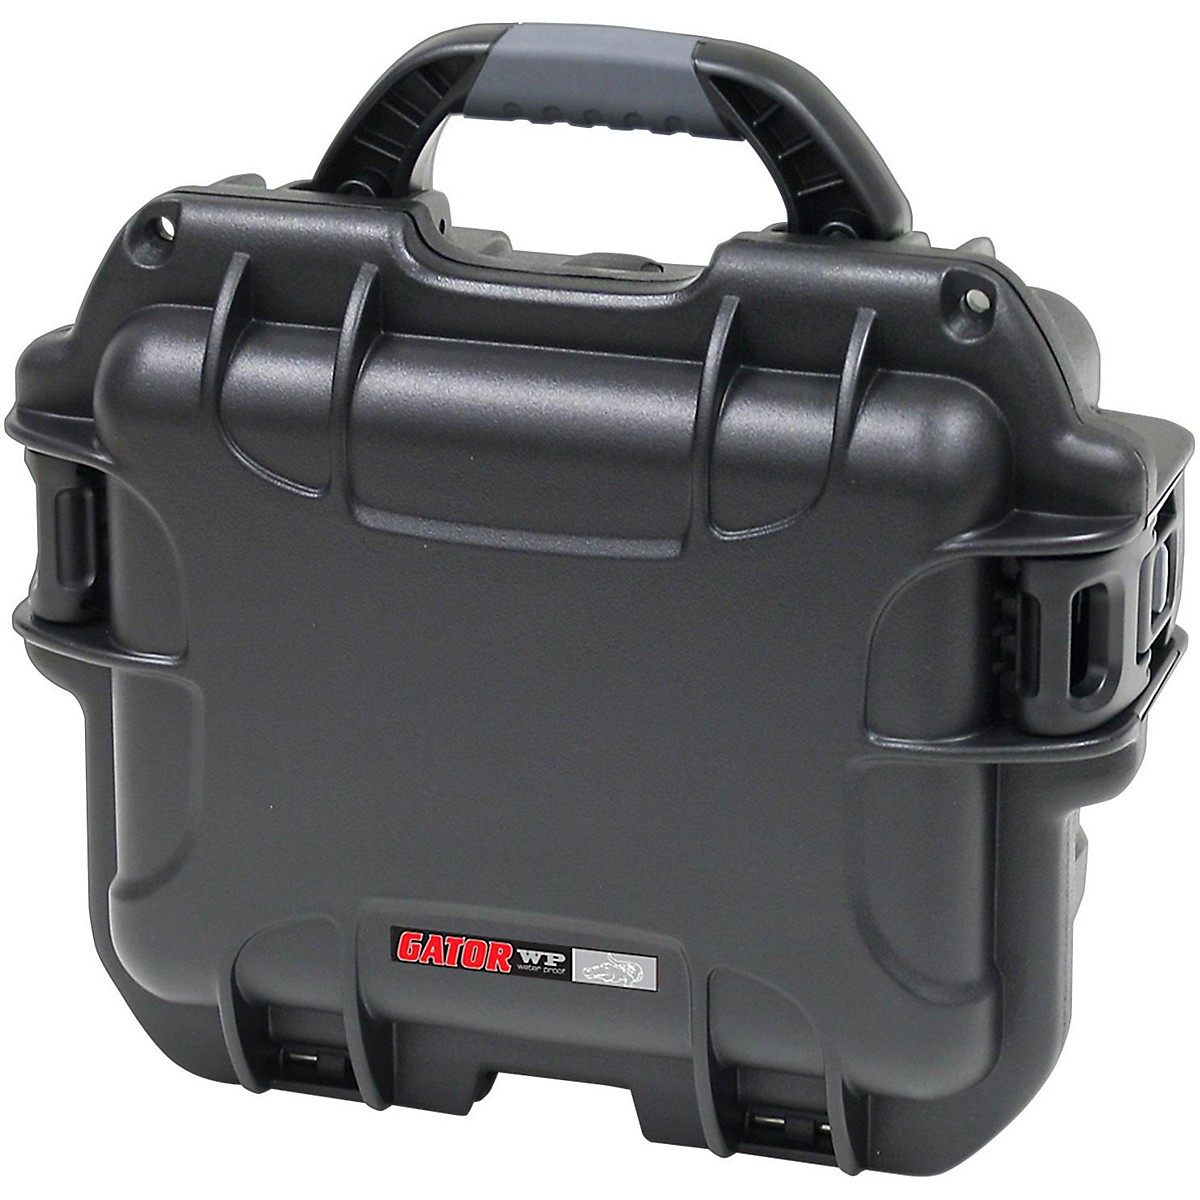 Gator GU-ZOOMH4N-WP Waterproof Injection Molded Case for Zoom H4N Handheld Recorder